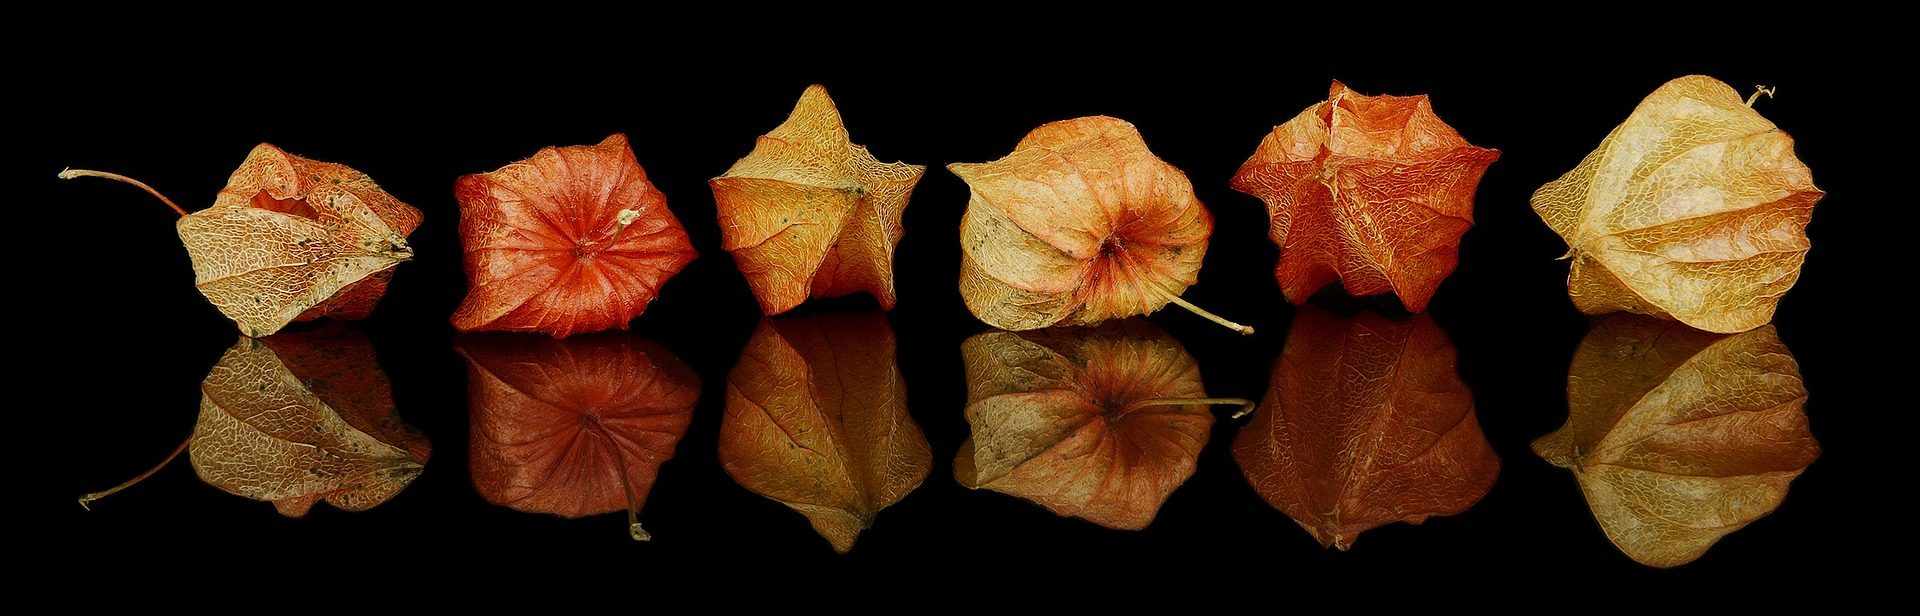 fall-decorations-1286757_1920